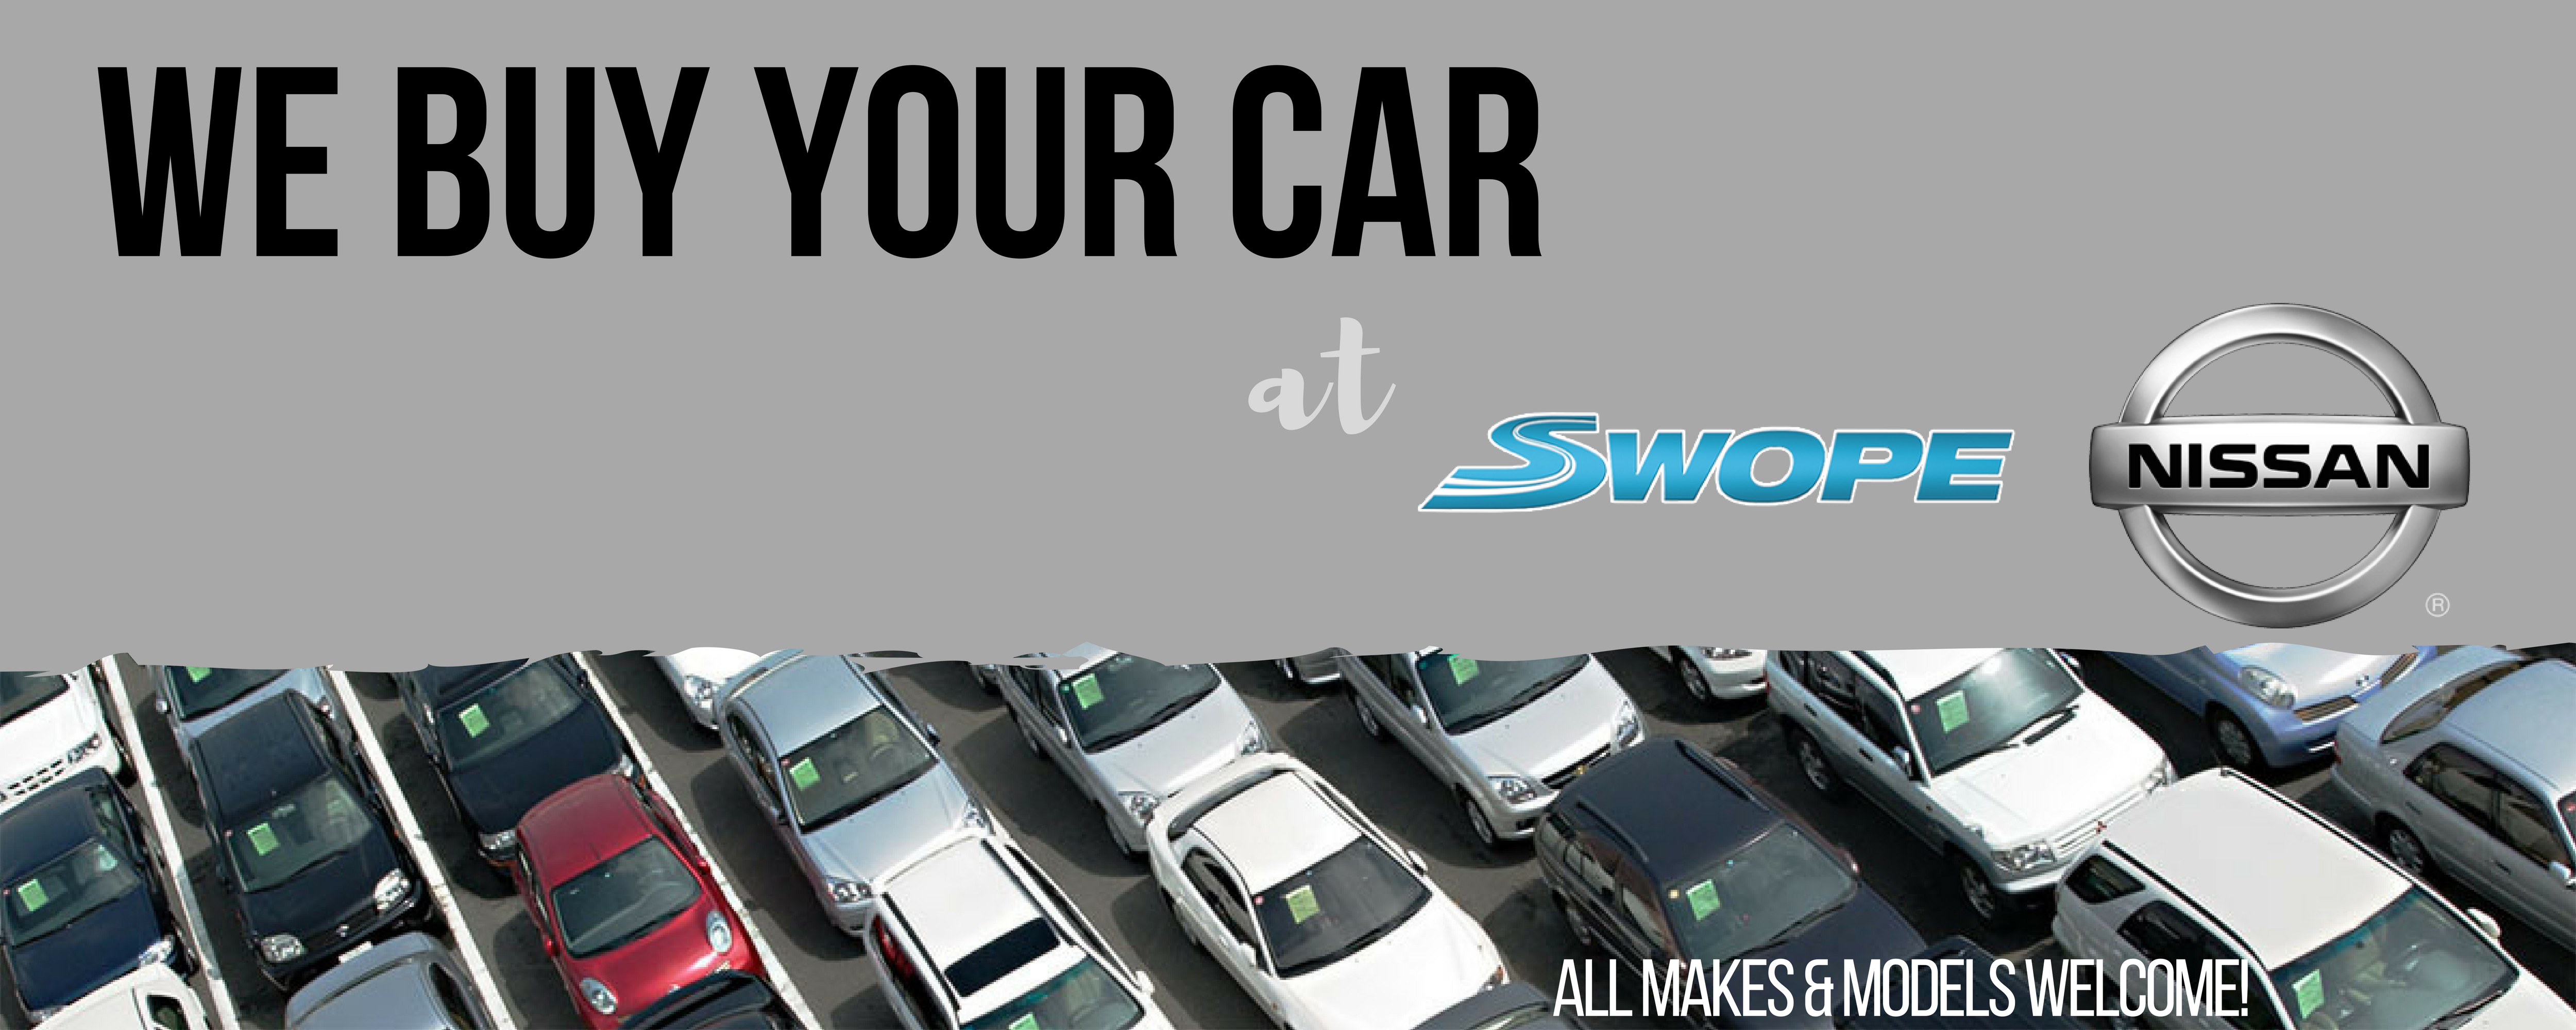 Magnificent We Buy Your Car Photos - Classic Cars Ideas - boiq.info